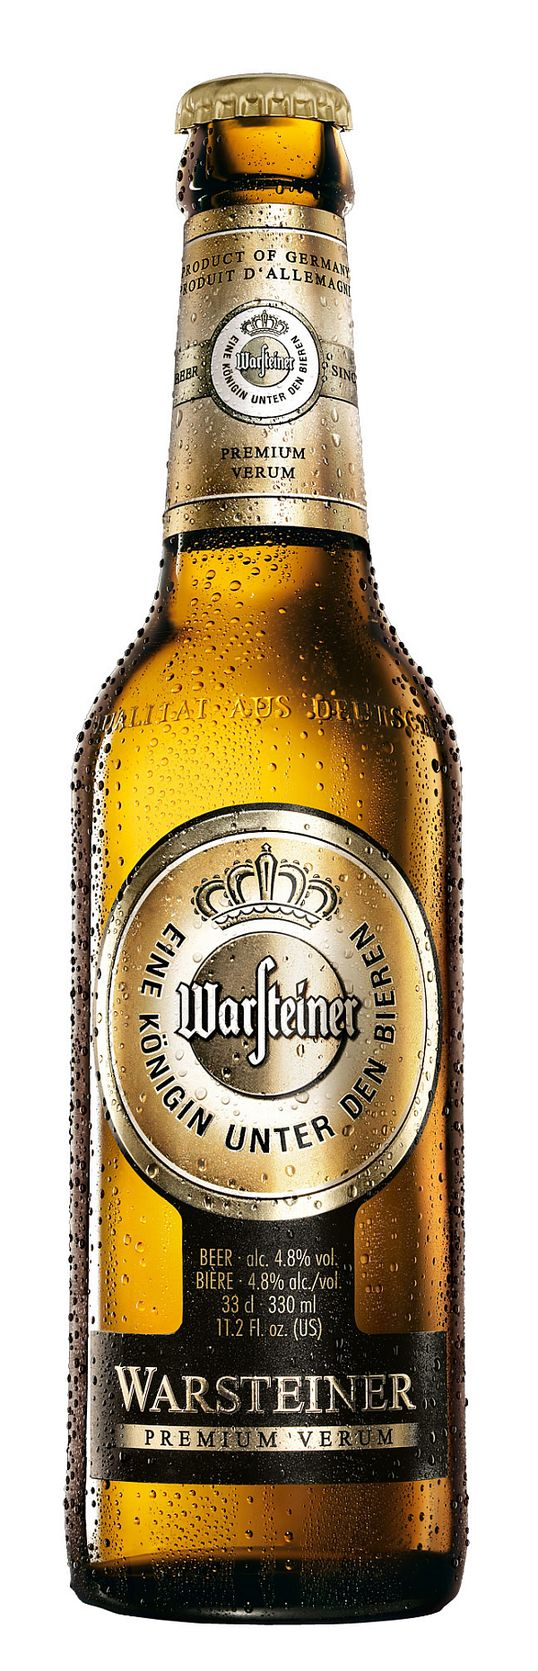 Warsteiner - Designed by Warsteiner Group | Beer Bottles ...